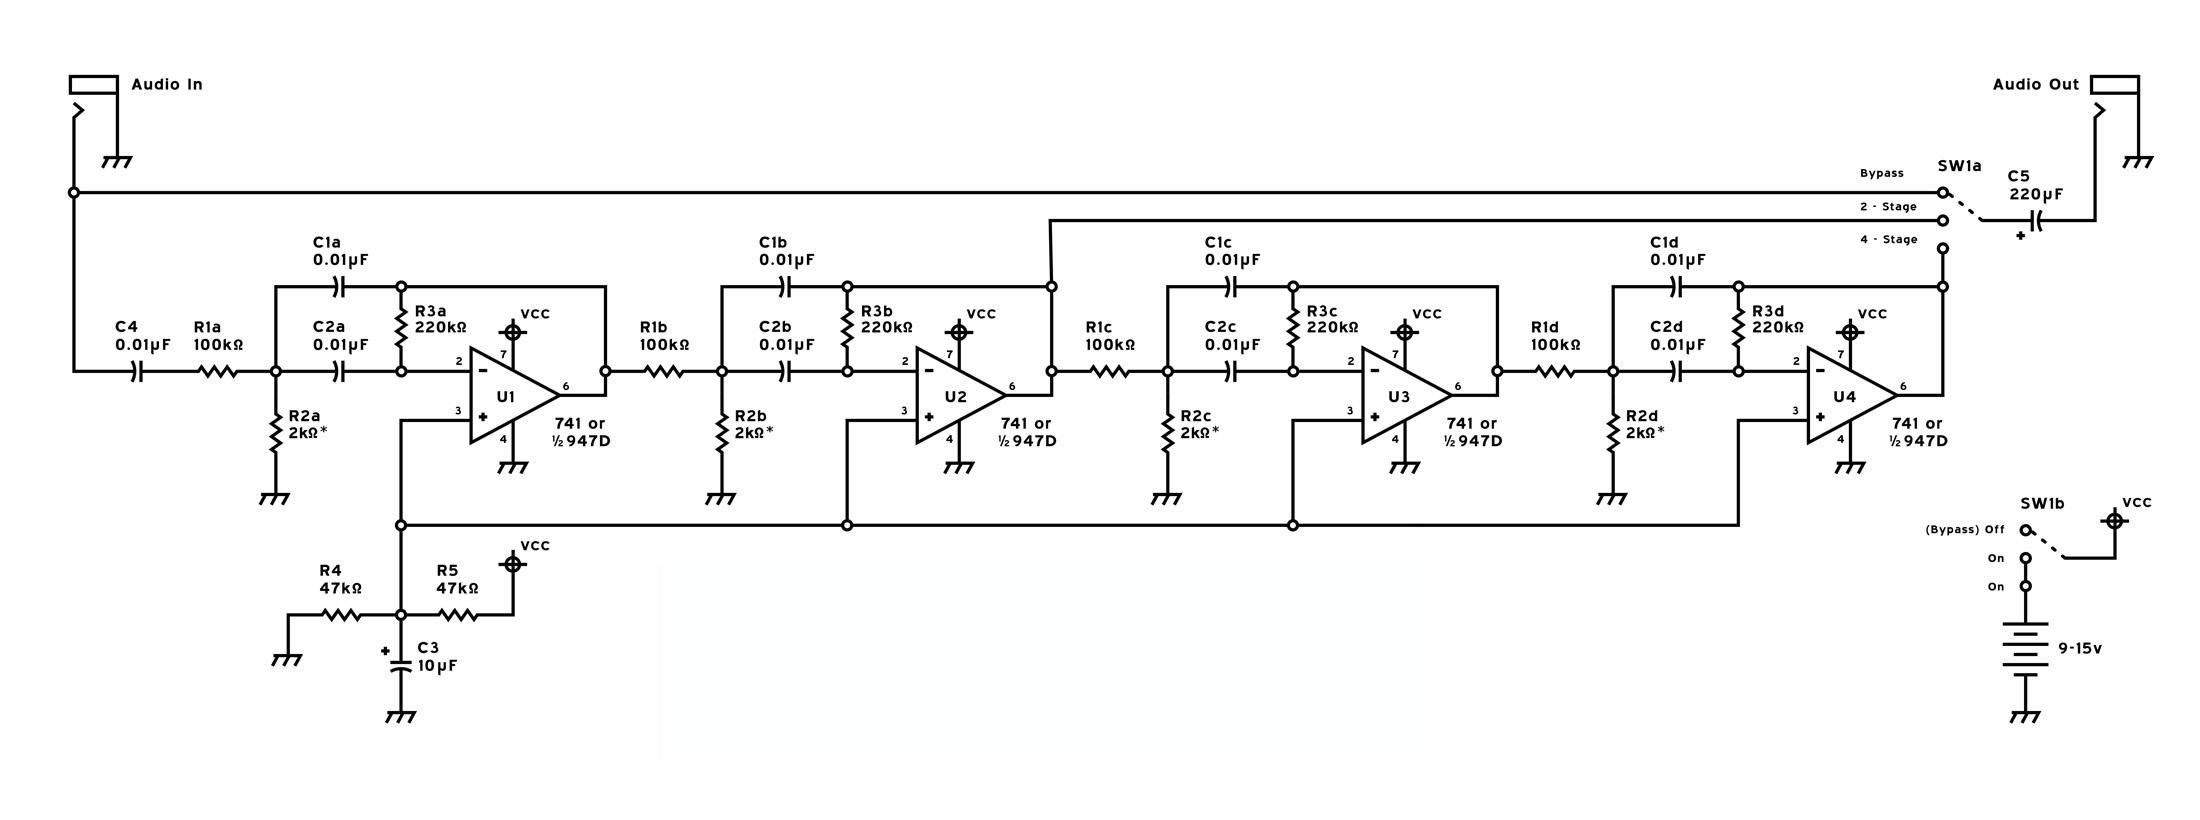 Cb Radio Mixer Wiring Auto Electrical Diagram 2004 Lexus Es330